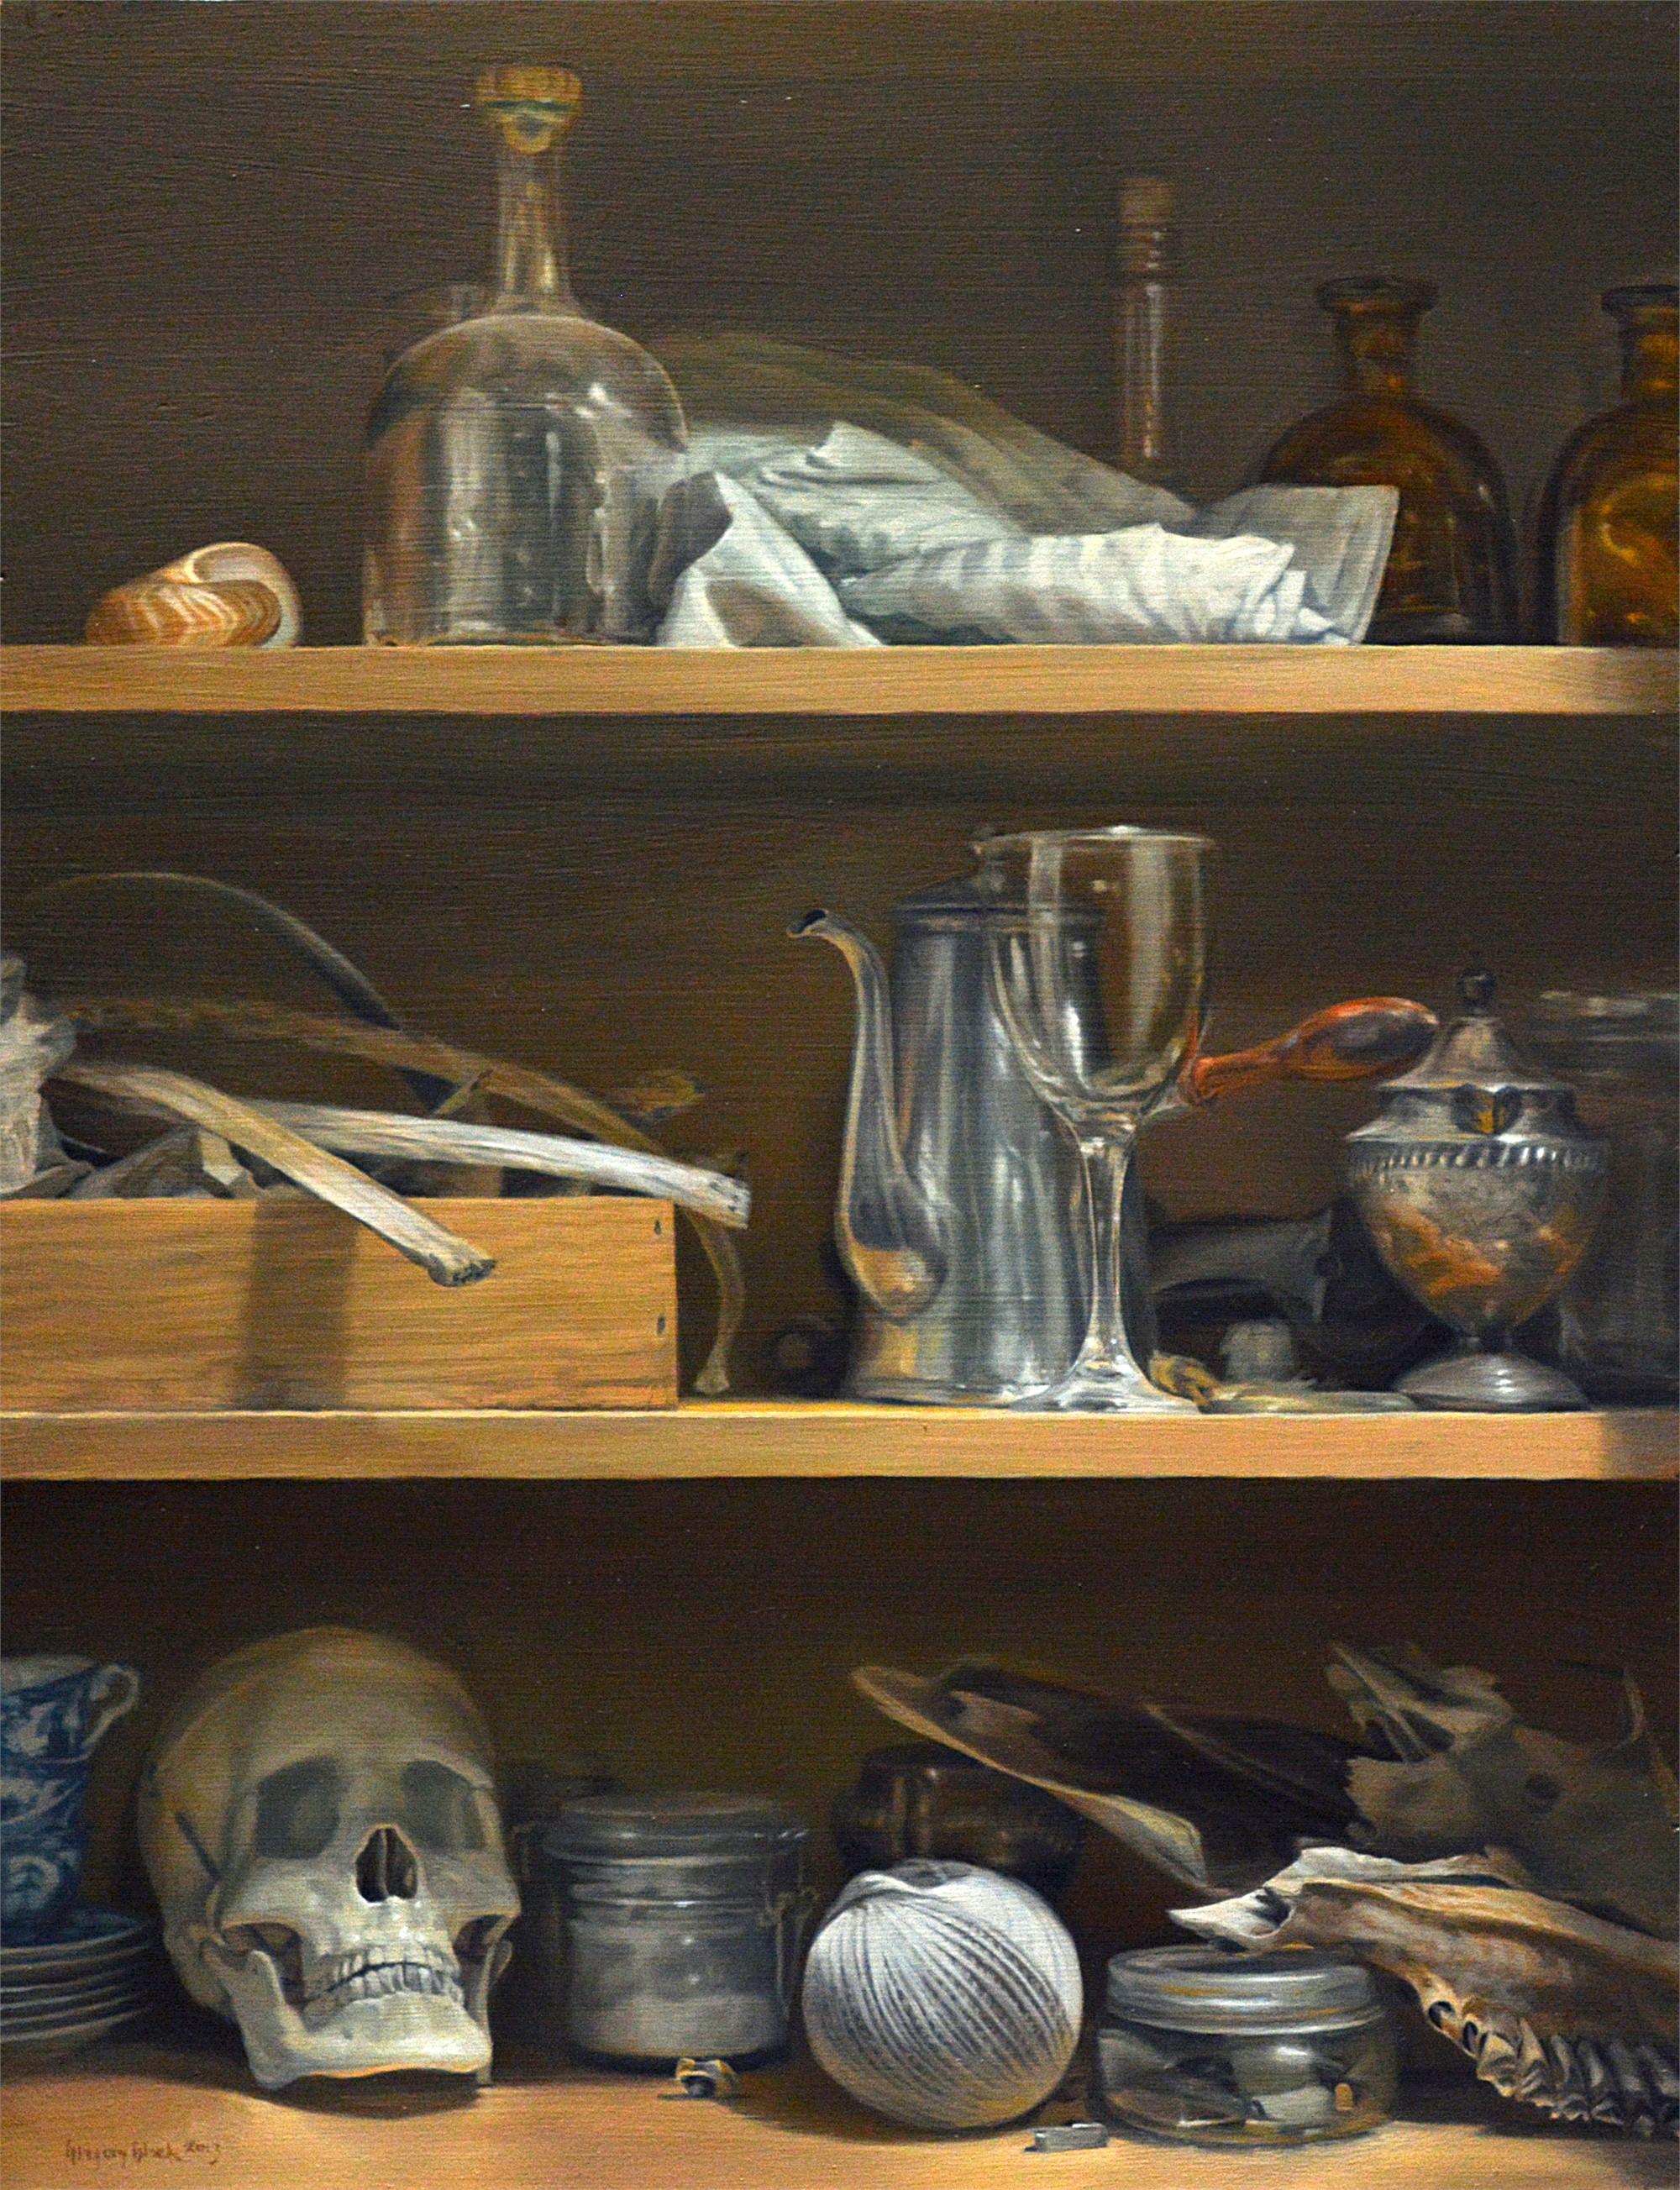 Curiosities by Gregory Block